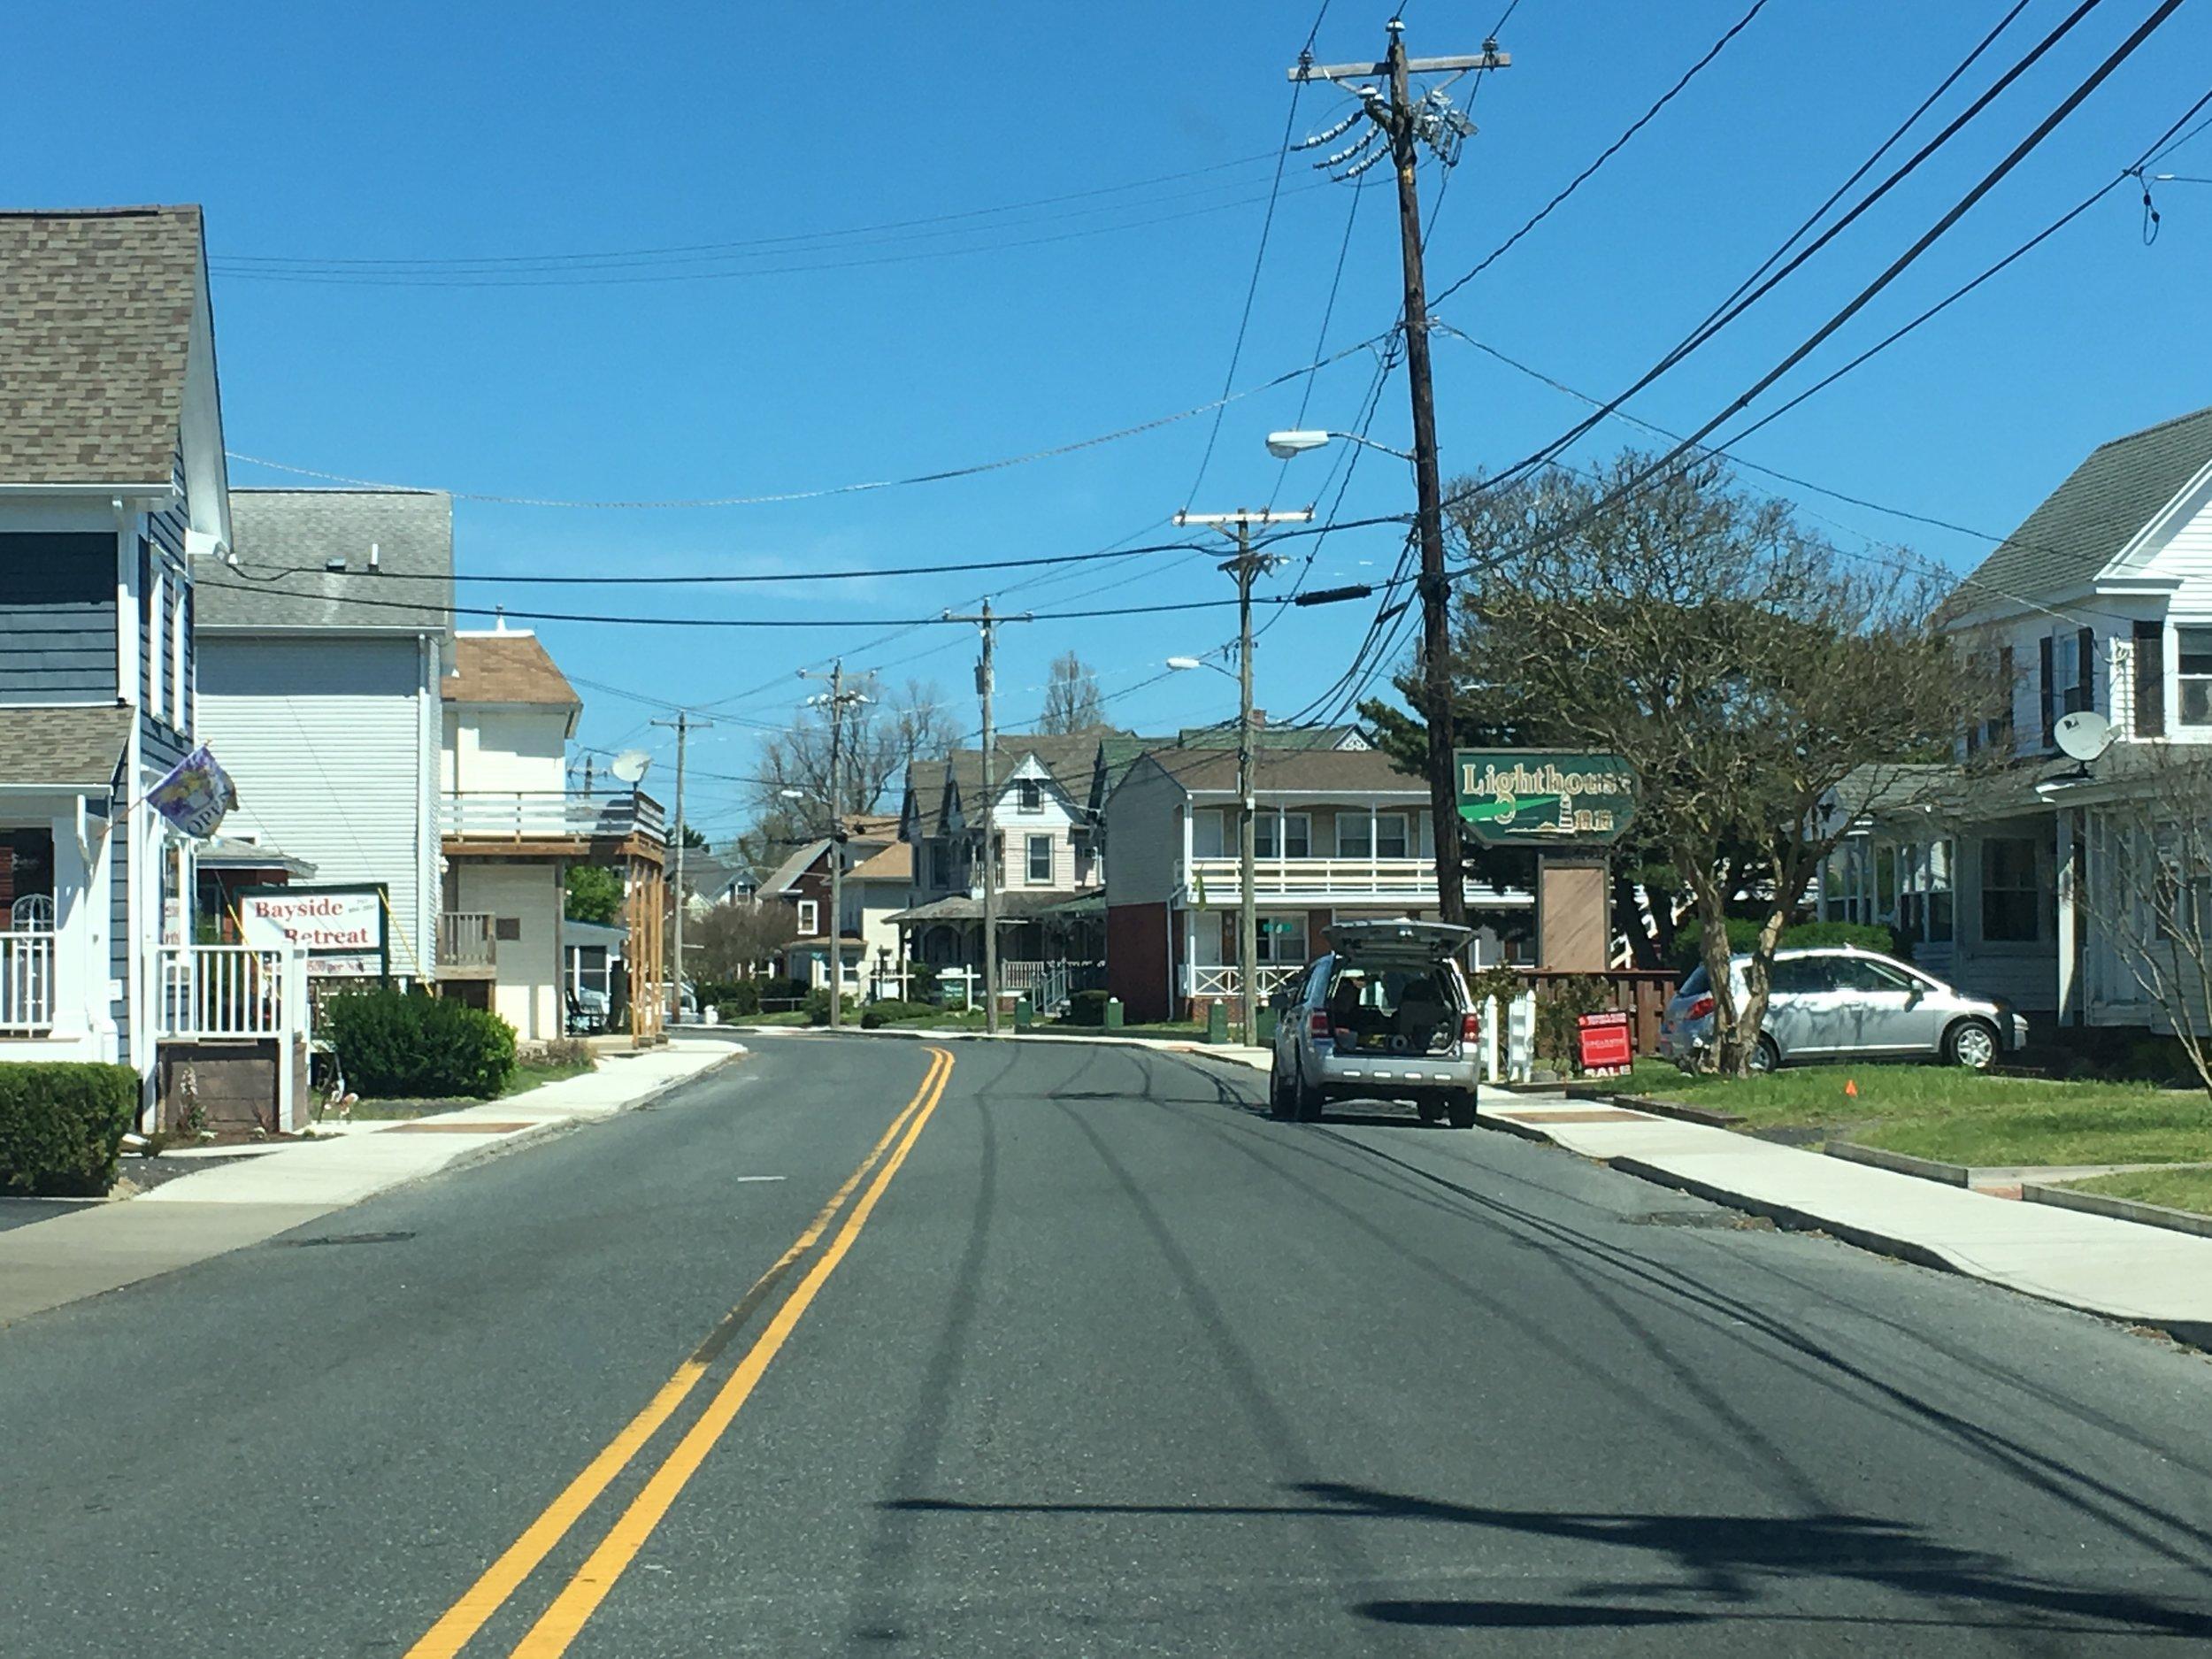 A typical street on Chincoteague Island, VA.